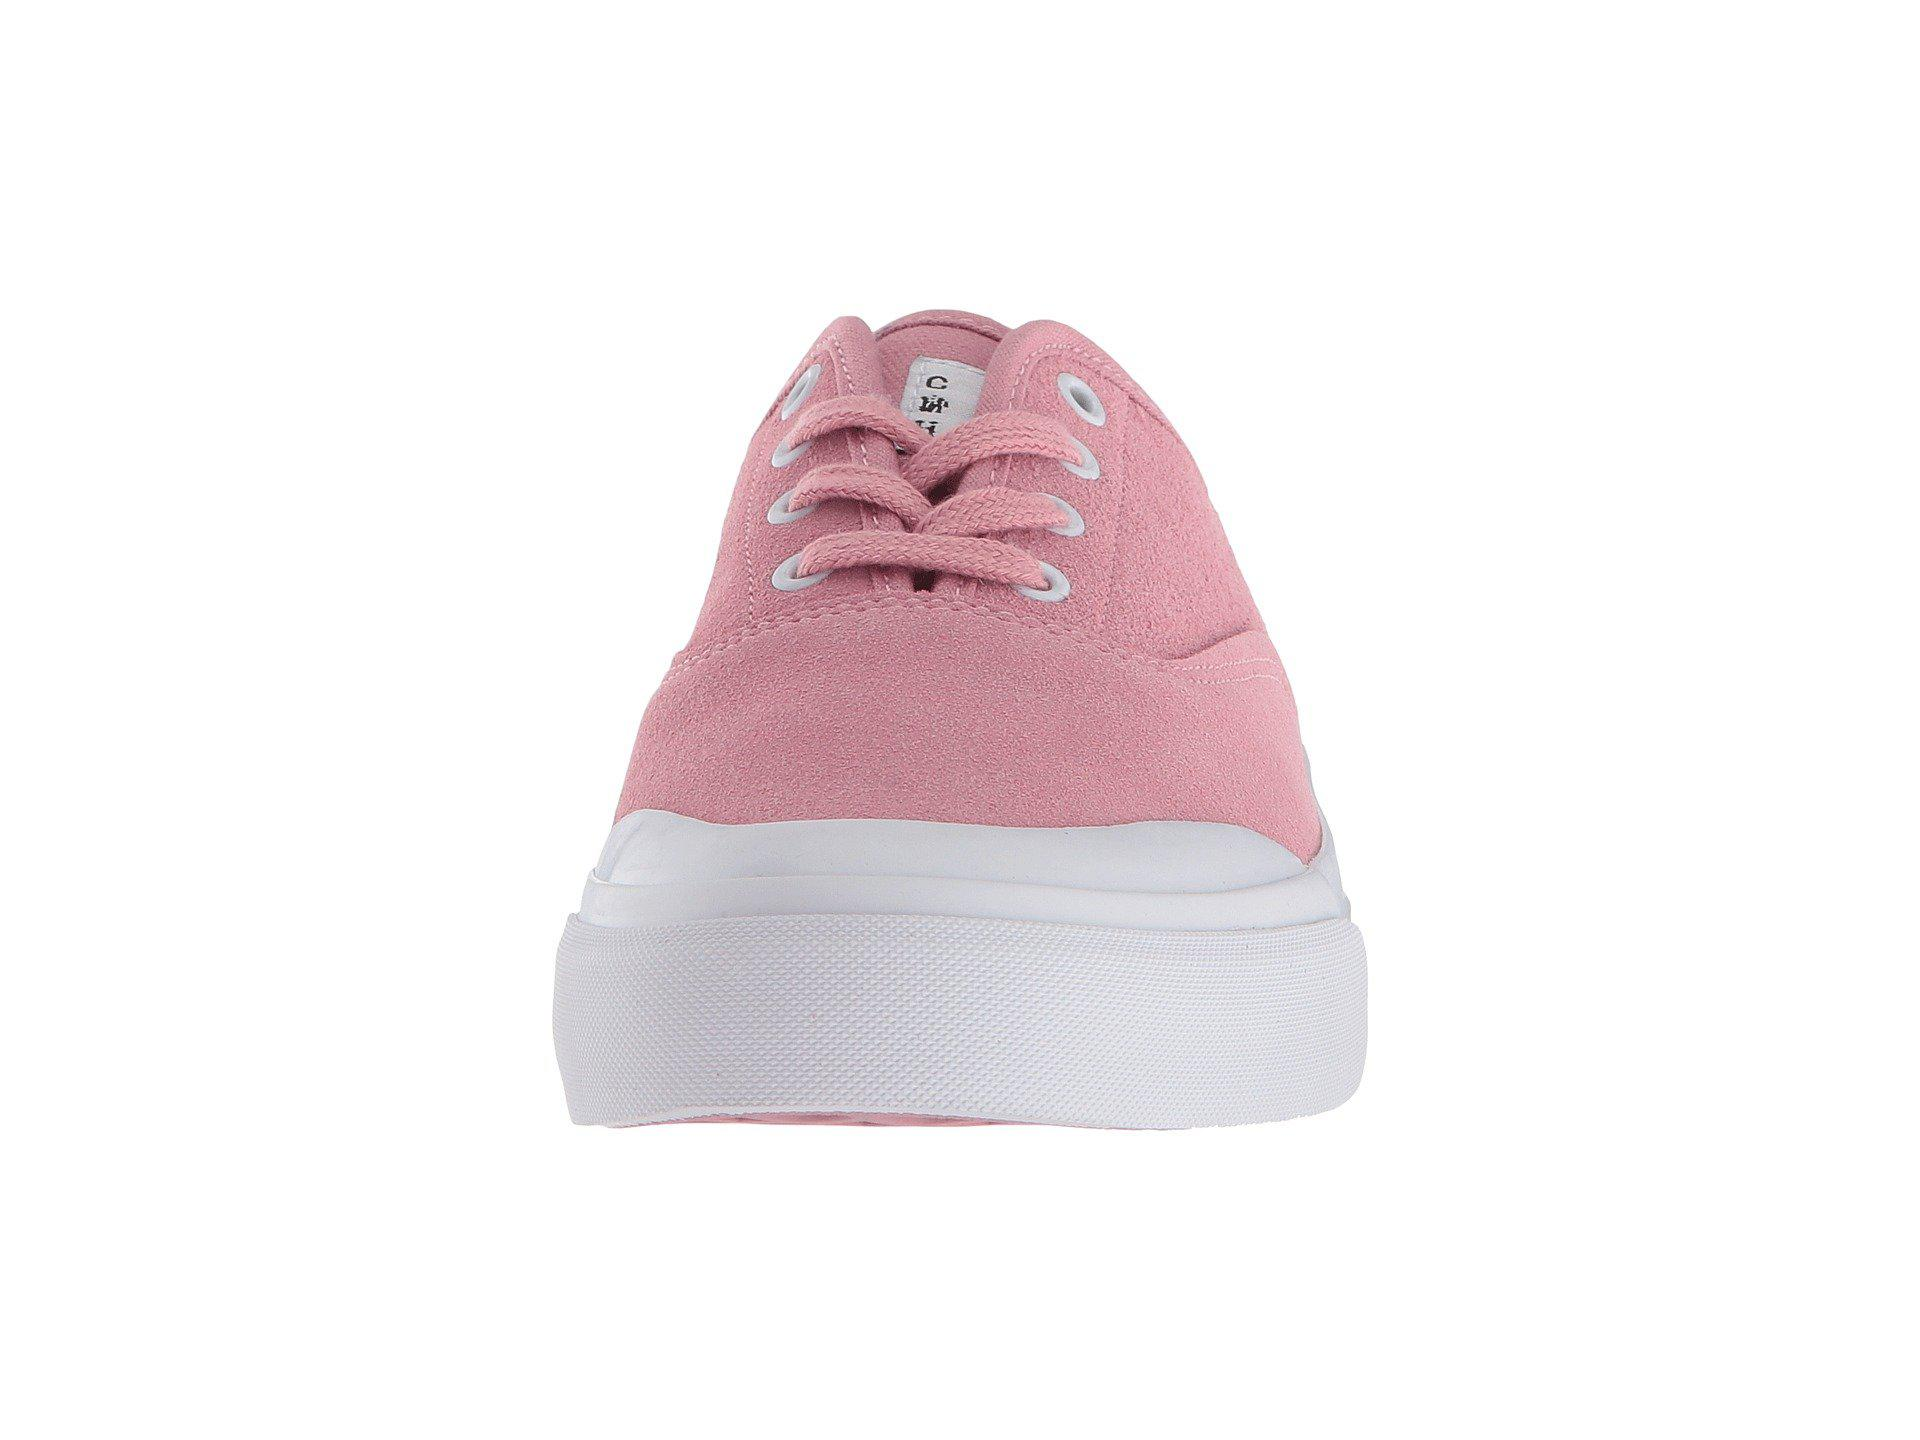 4b3bf71064adc Huf Cromer (flamingo) Men's Skate Shoes in Pink for Men - Lyst